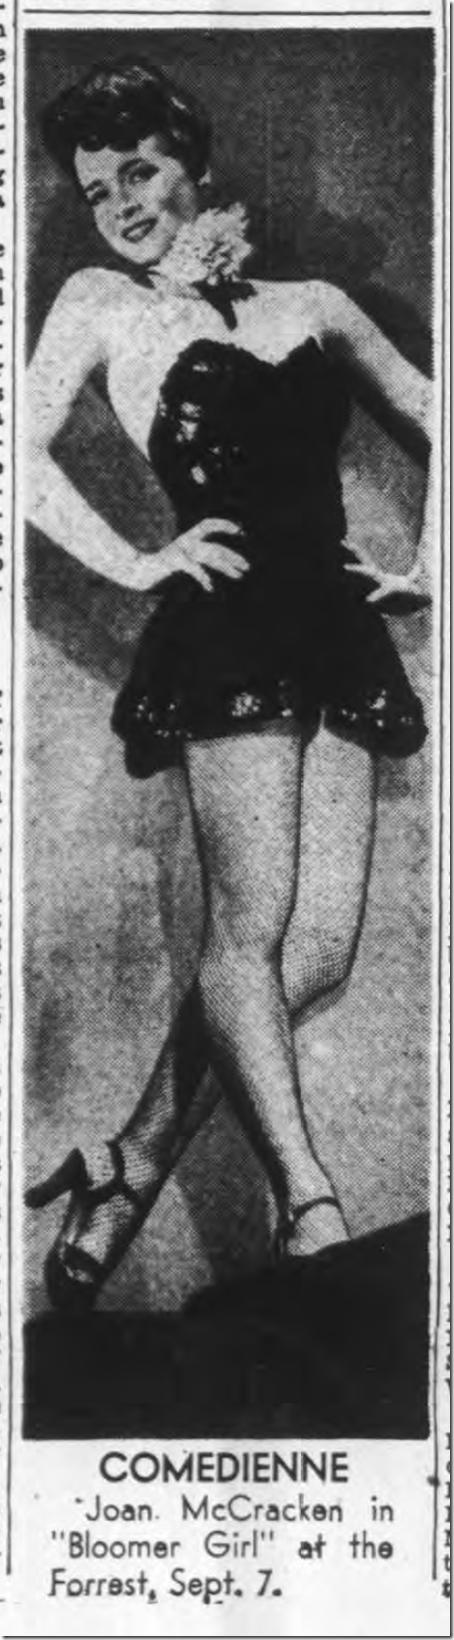 Aug. 27, 1944, Joan McCracken